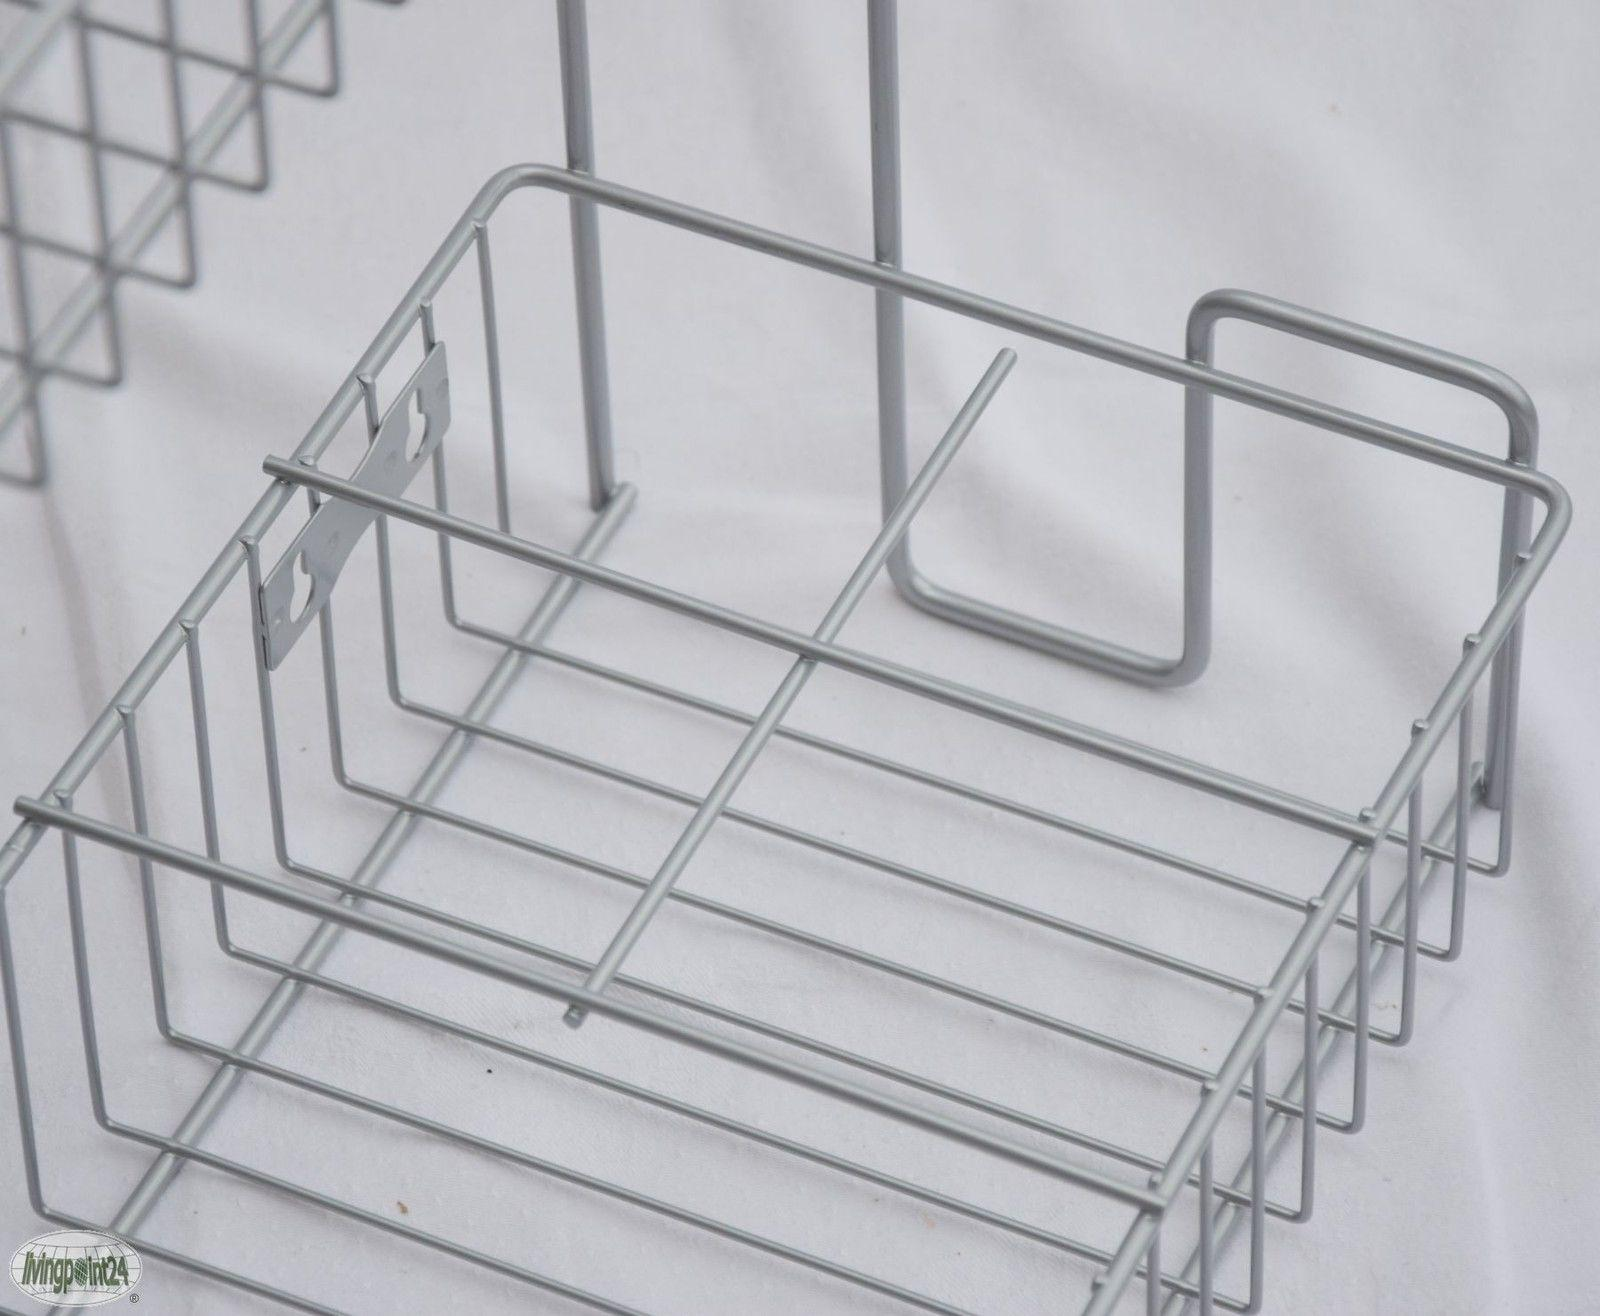 putzmittelauszug schrankauszug 30 cm schrank k chenauszug badschrank auszug 163 kaufen bei. Black Bedroom Furniture Sets. Home Design Ideas